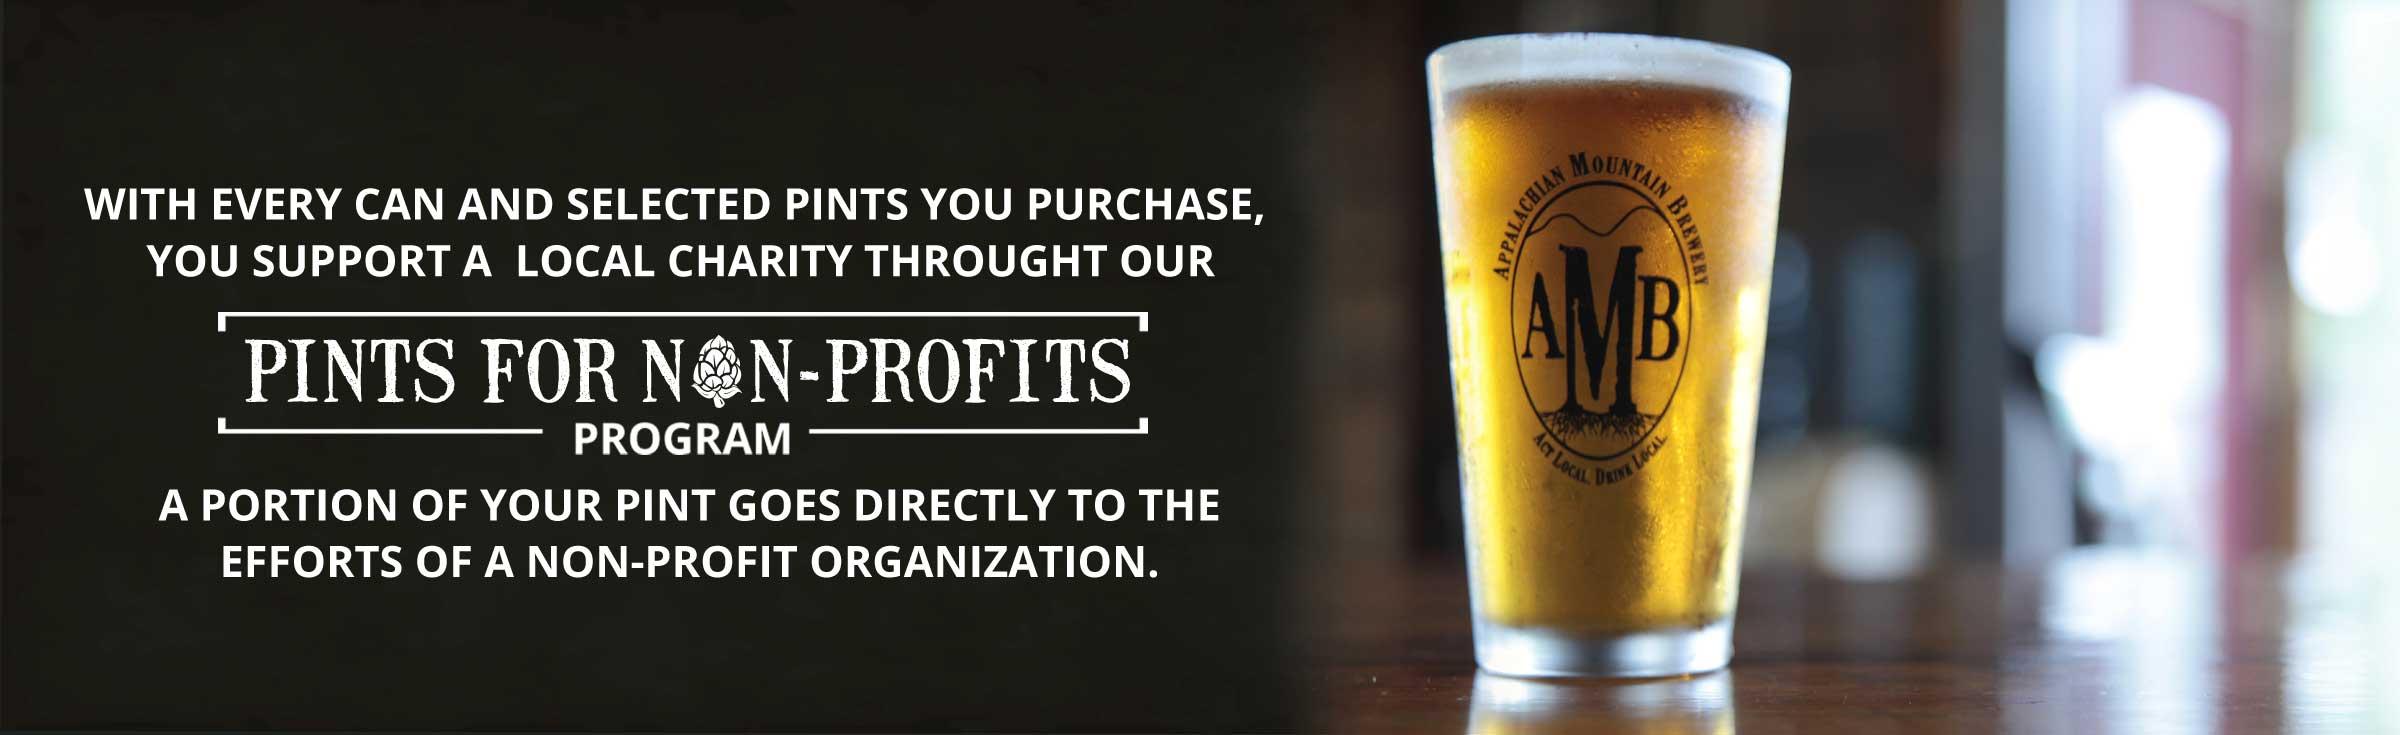 non-profits.jpg